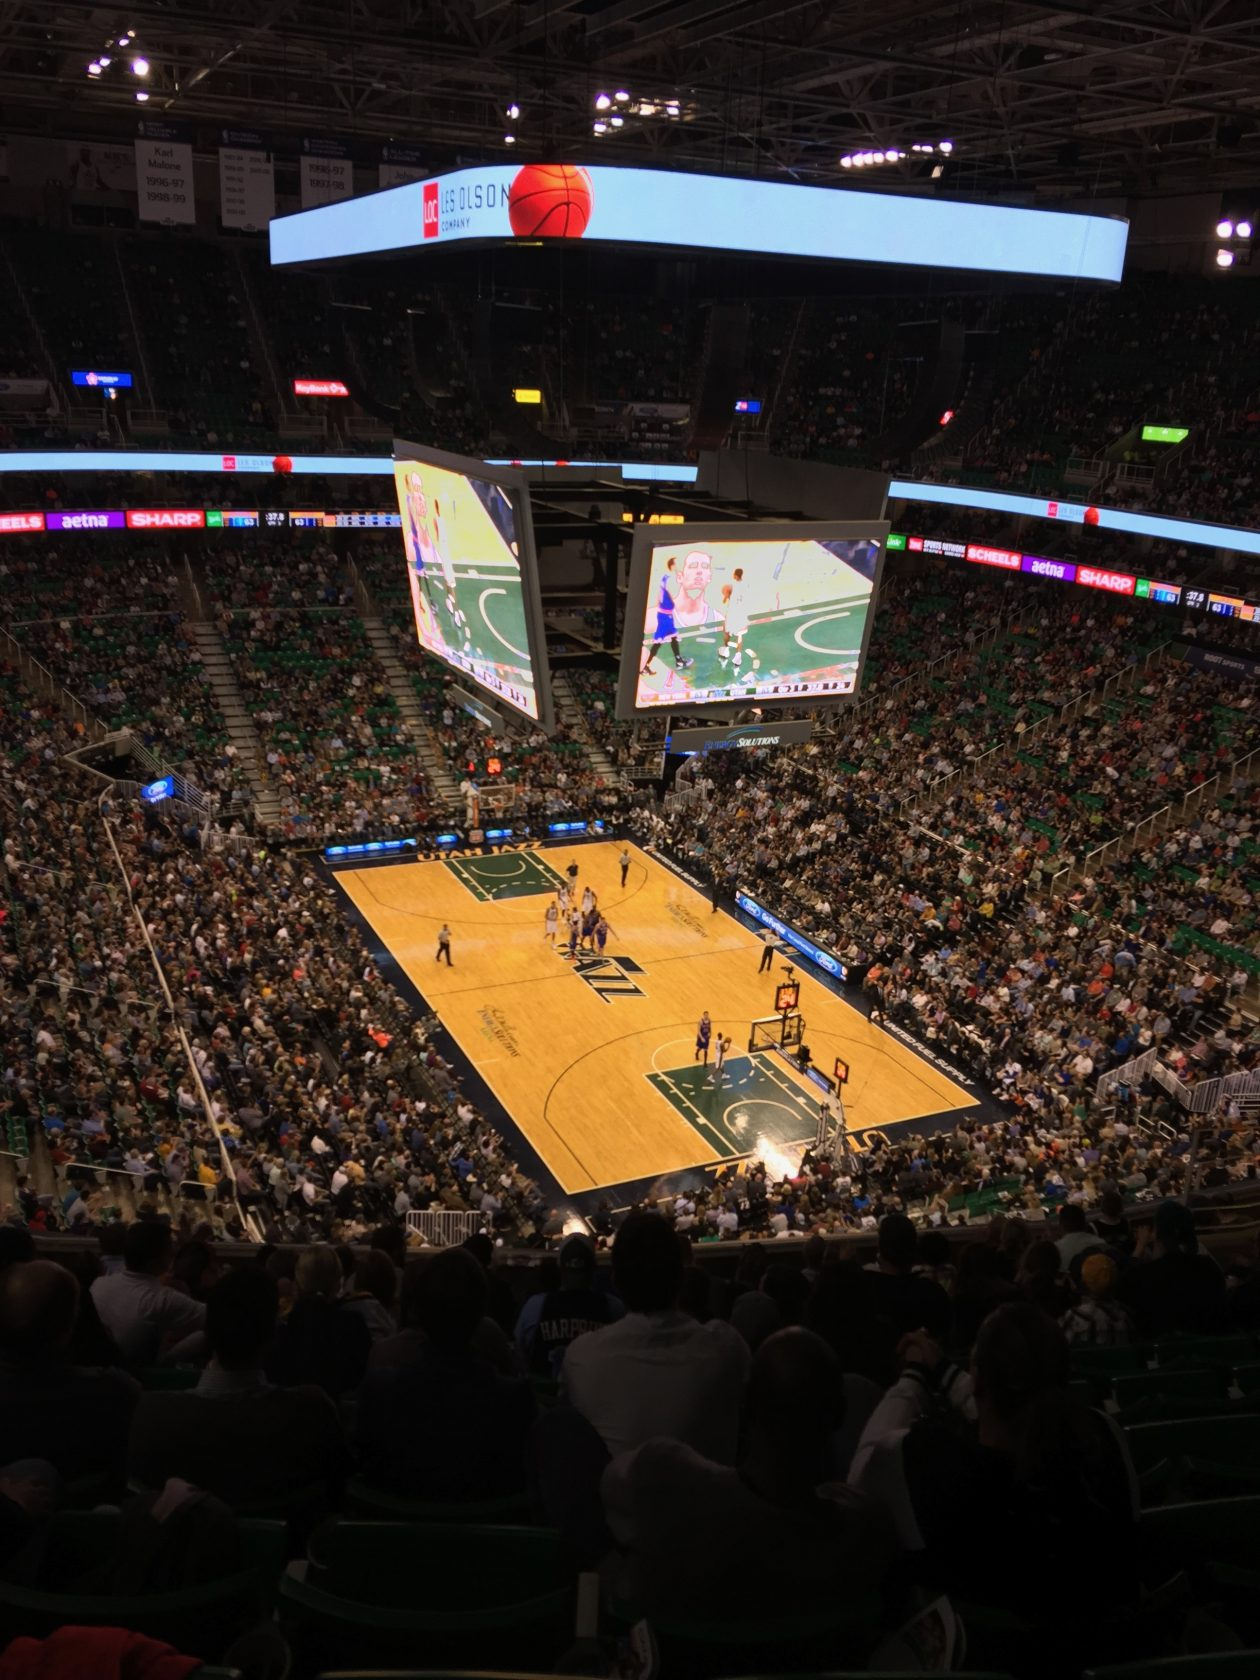 Utah Jazz (EnergySolutions Arena)